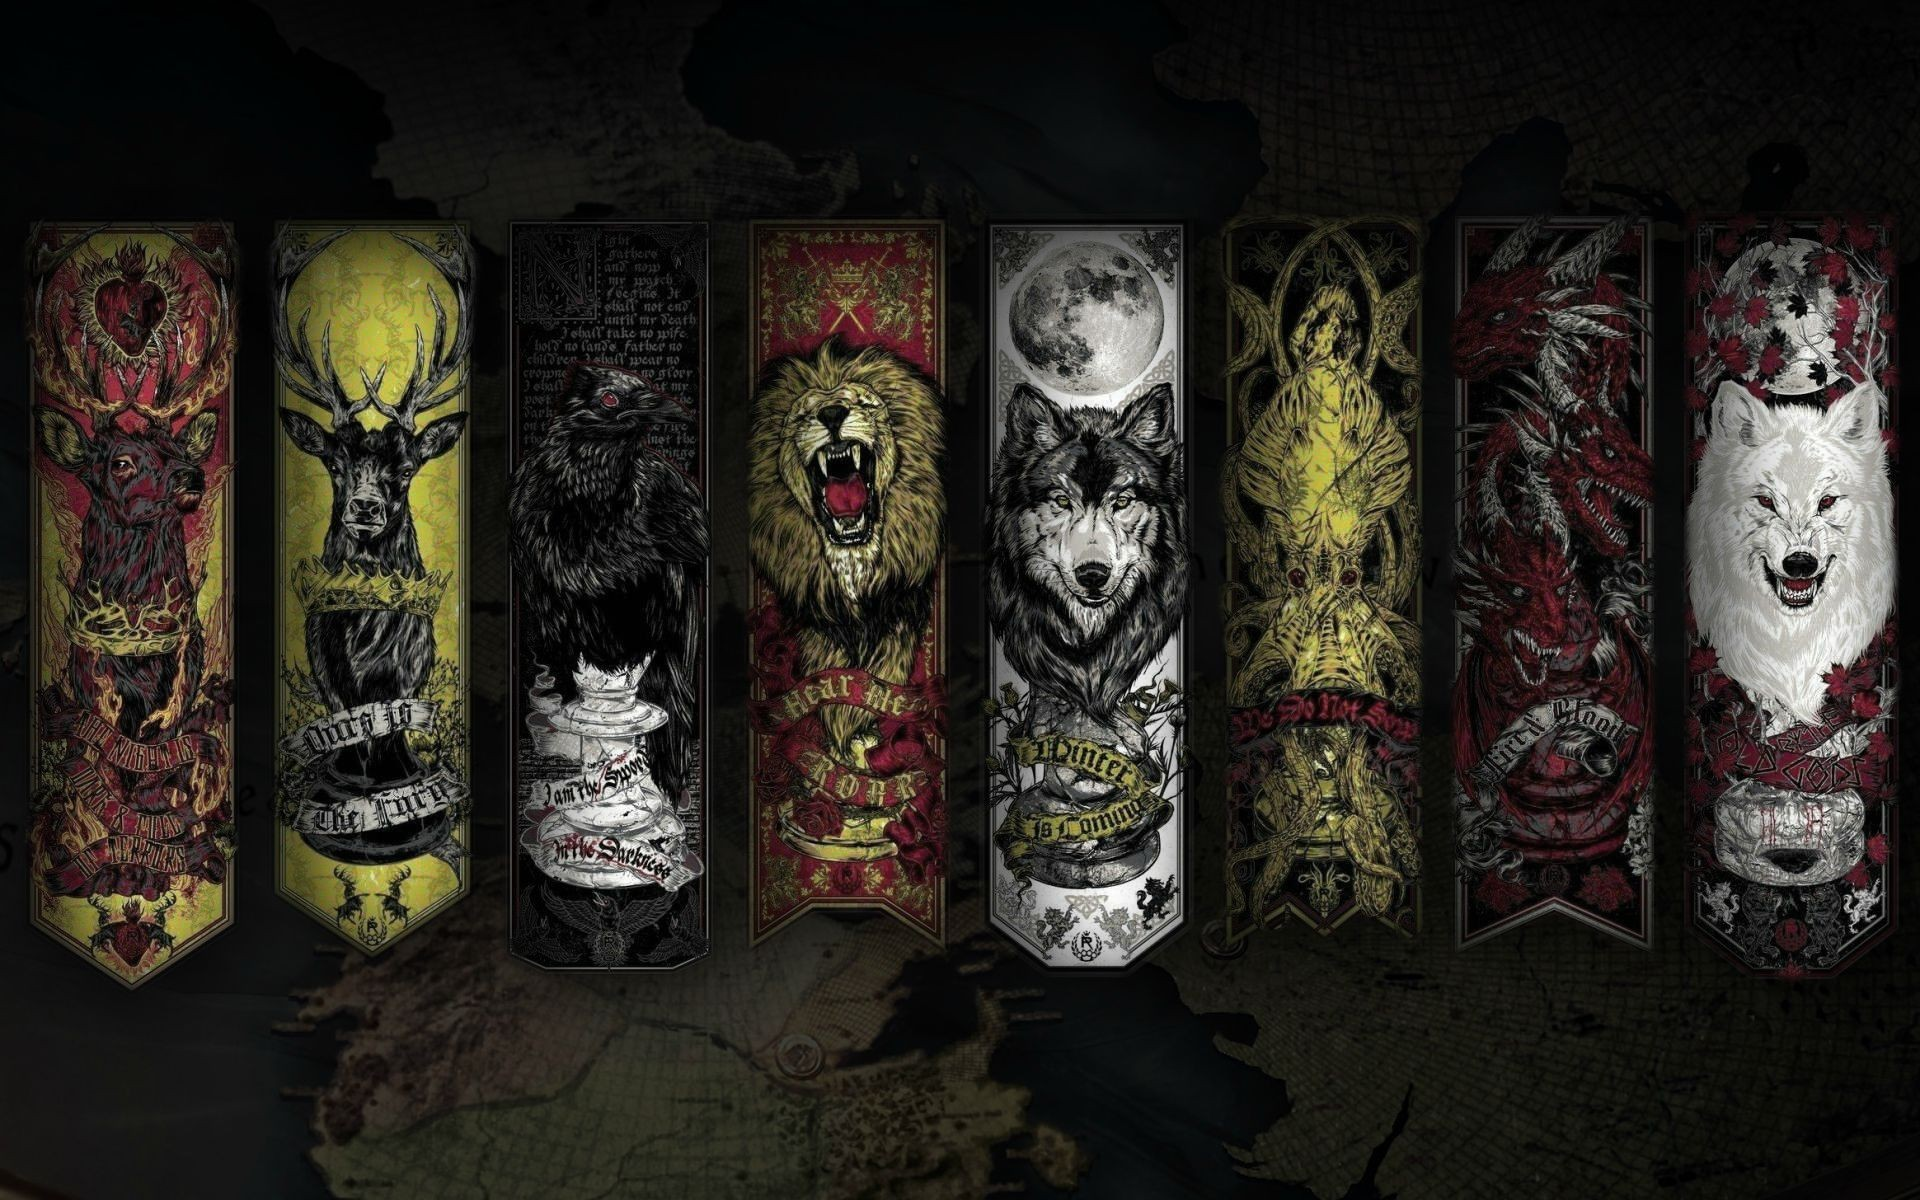 Game of Thrones HD Wallpaper – Sigils